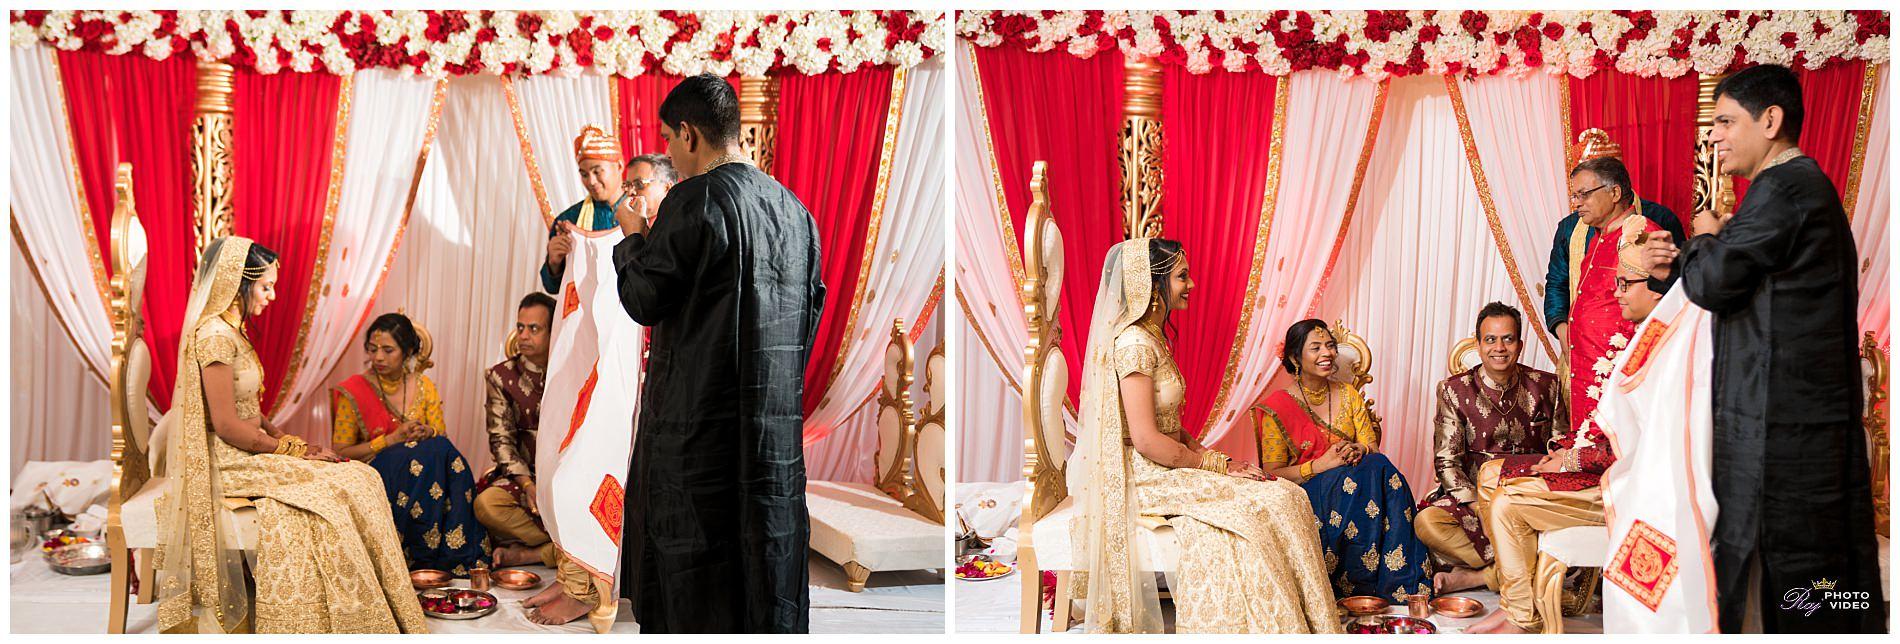 Aashirwad-Palace-Randolph-NJ-Hindu-Wedding-Ceremony-Khusbu-Jeff-9.jpg